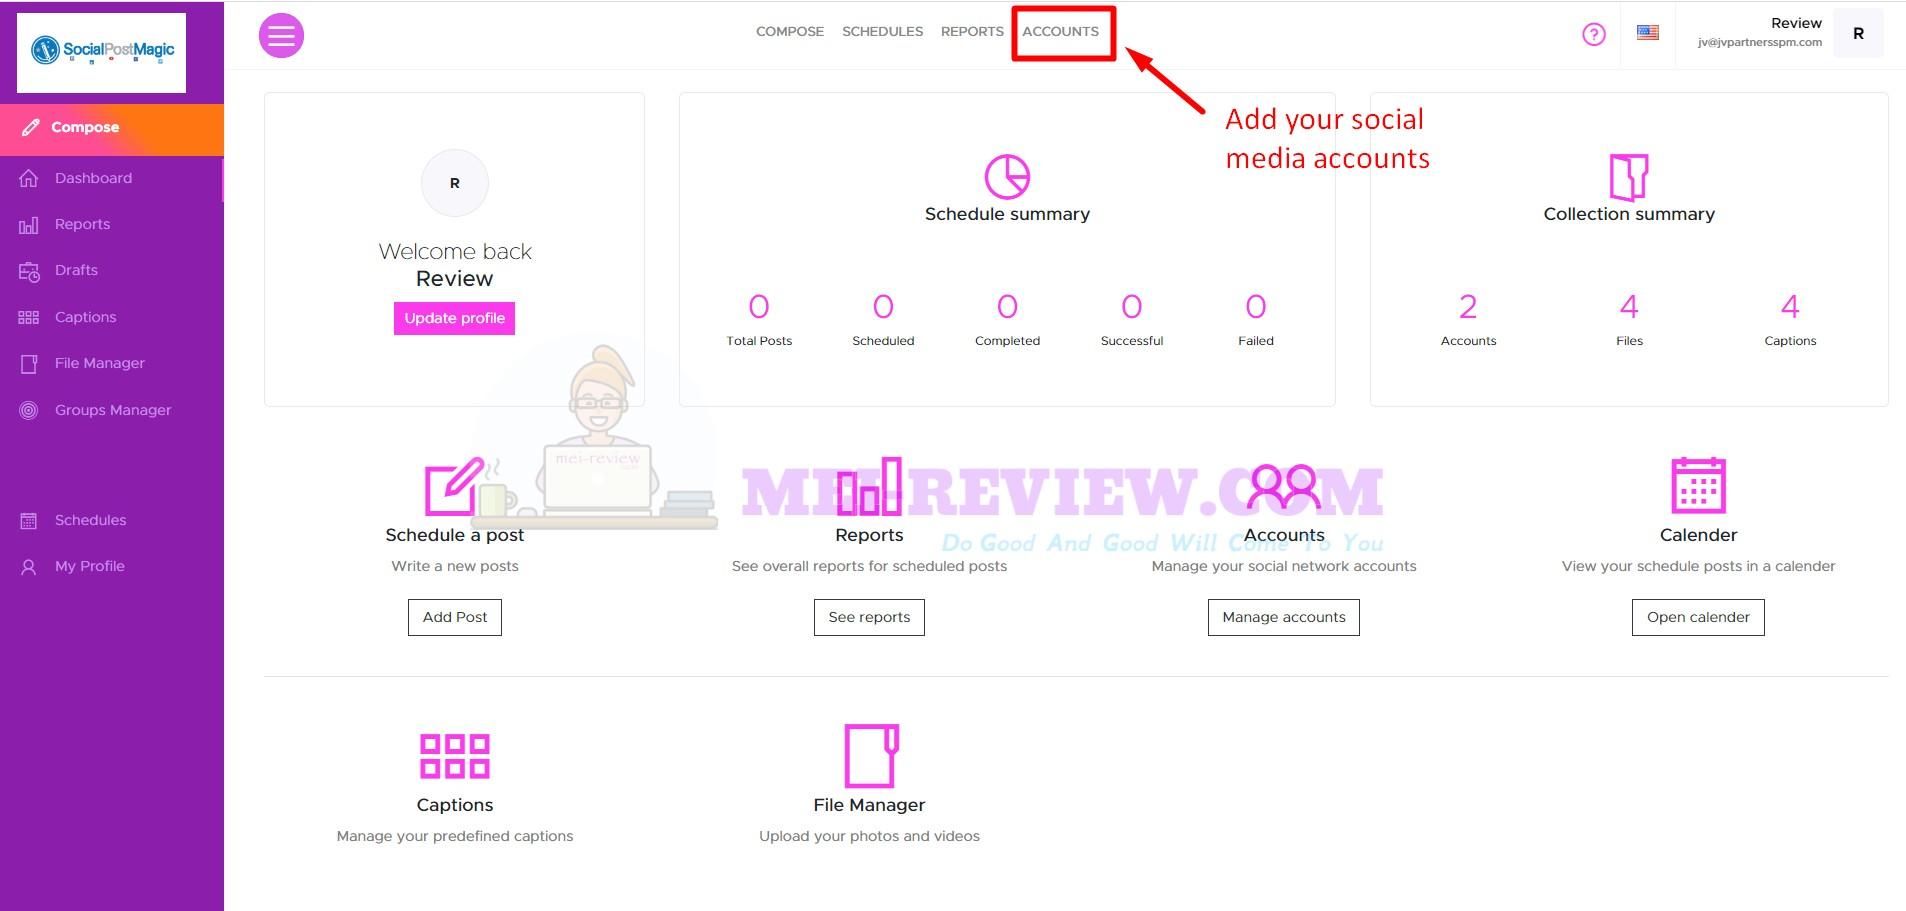 Social-Post-Magic-Step-1-add-account